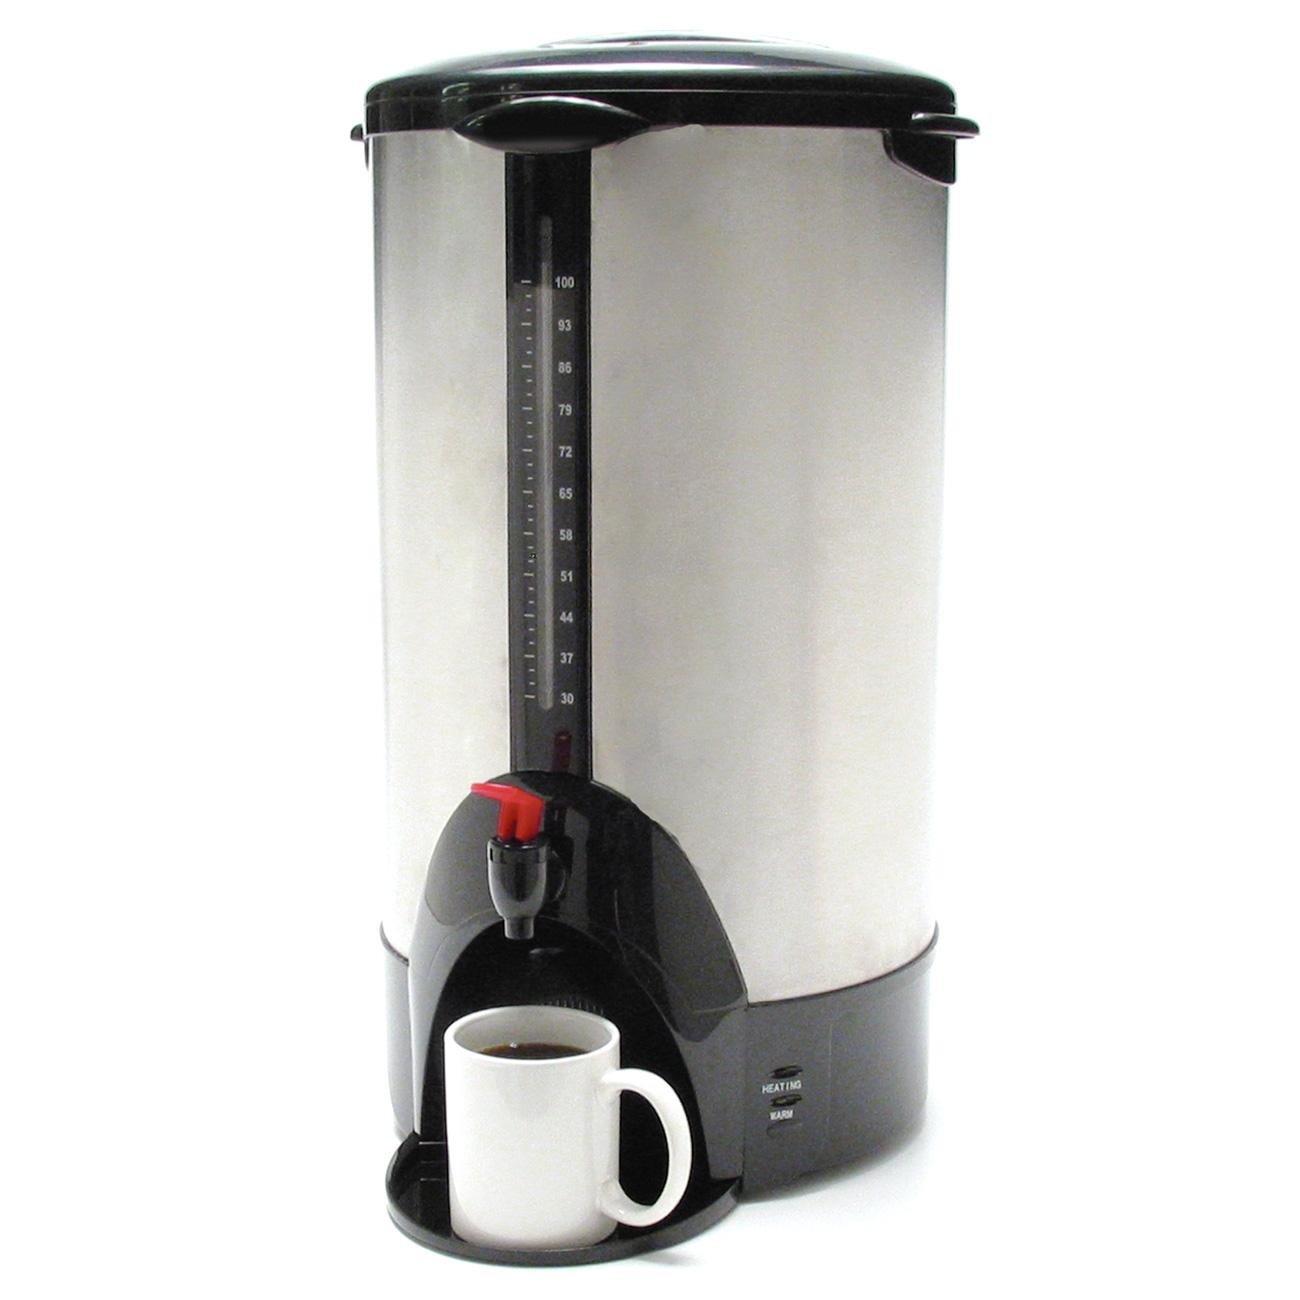 Coffee Pro CFPCP100 Coffee Makers, 12.5'' Length, 12.5'' Width, 13.3'' Height, 23 lb